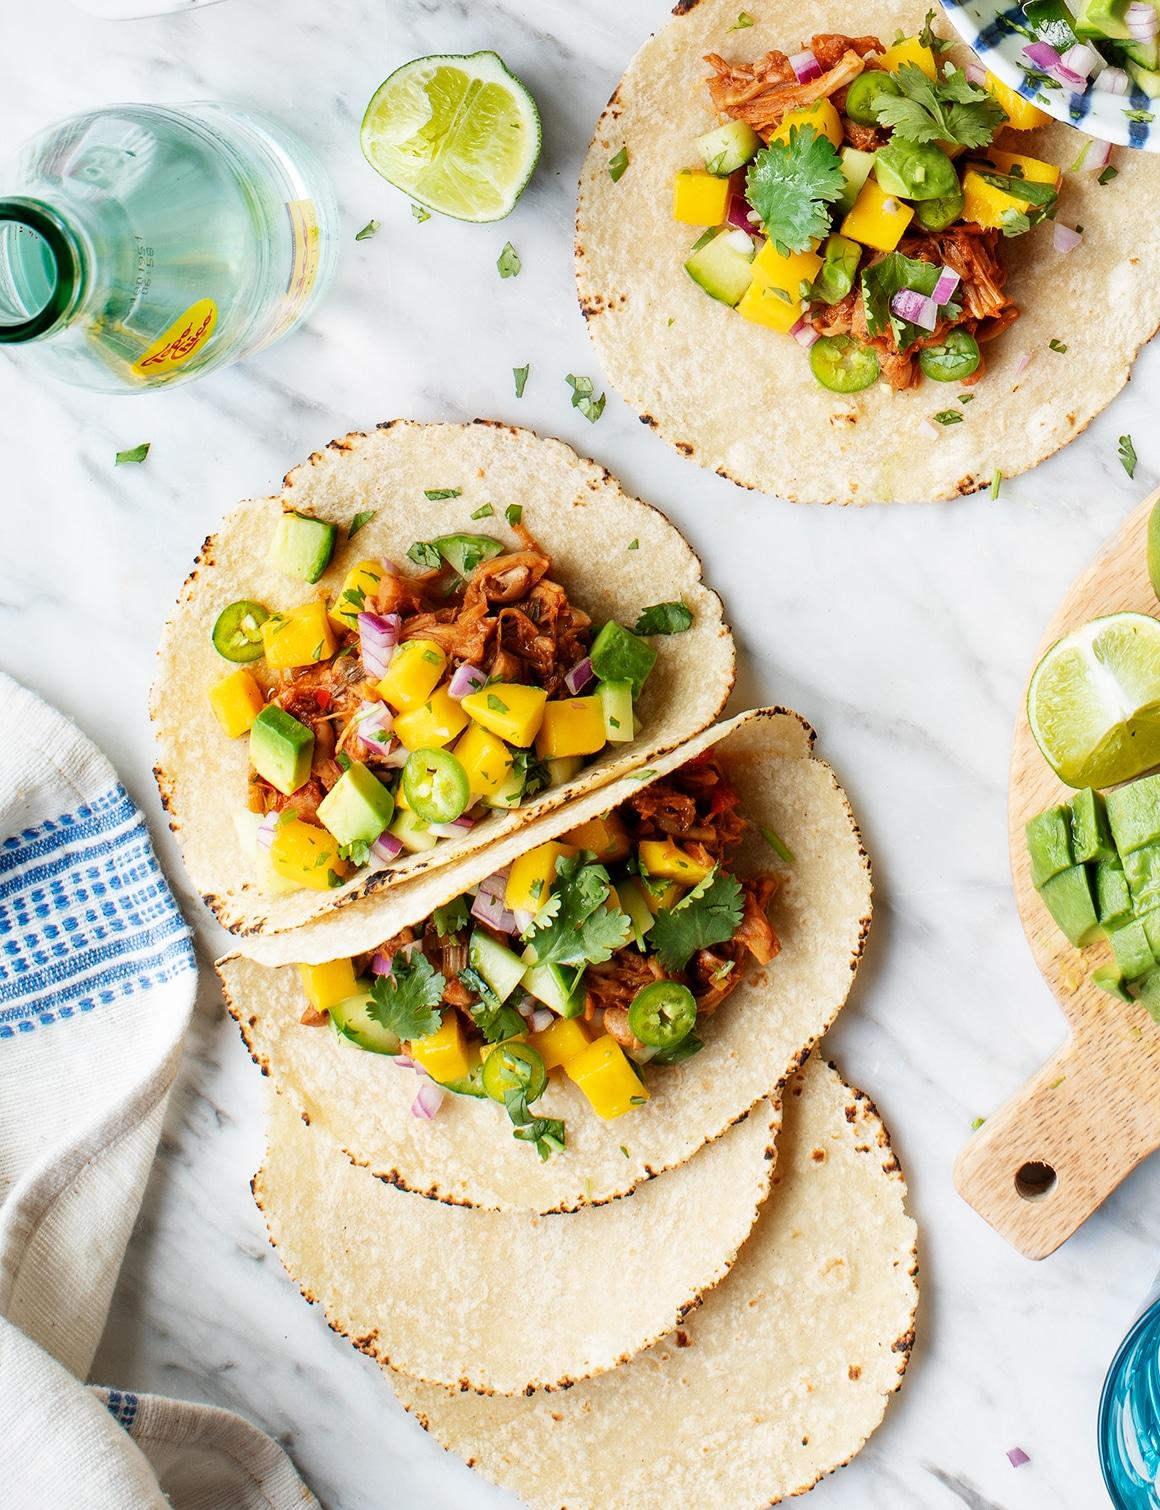 jamaican jerk jackfruit tacos evolve summer recipes blog